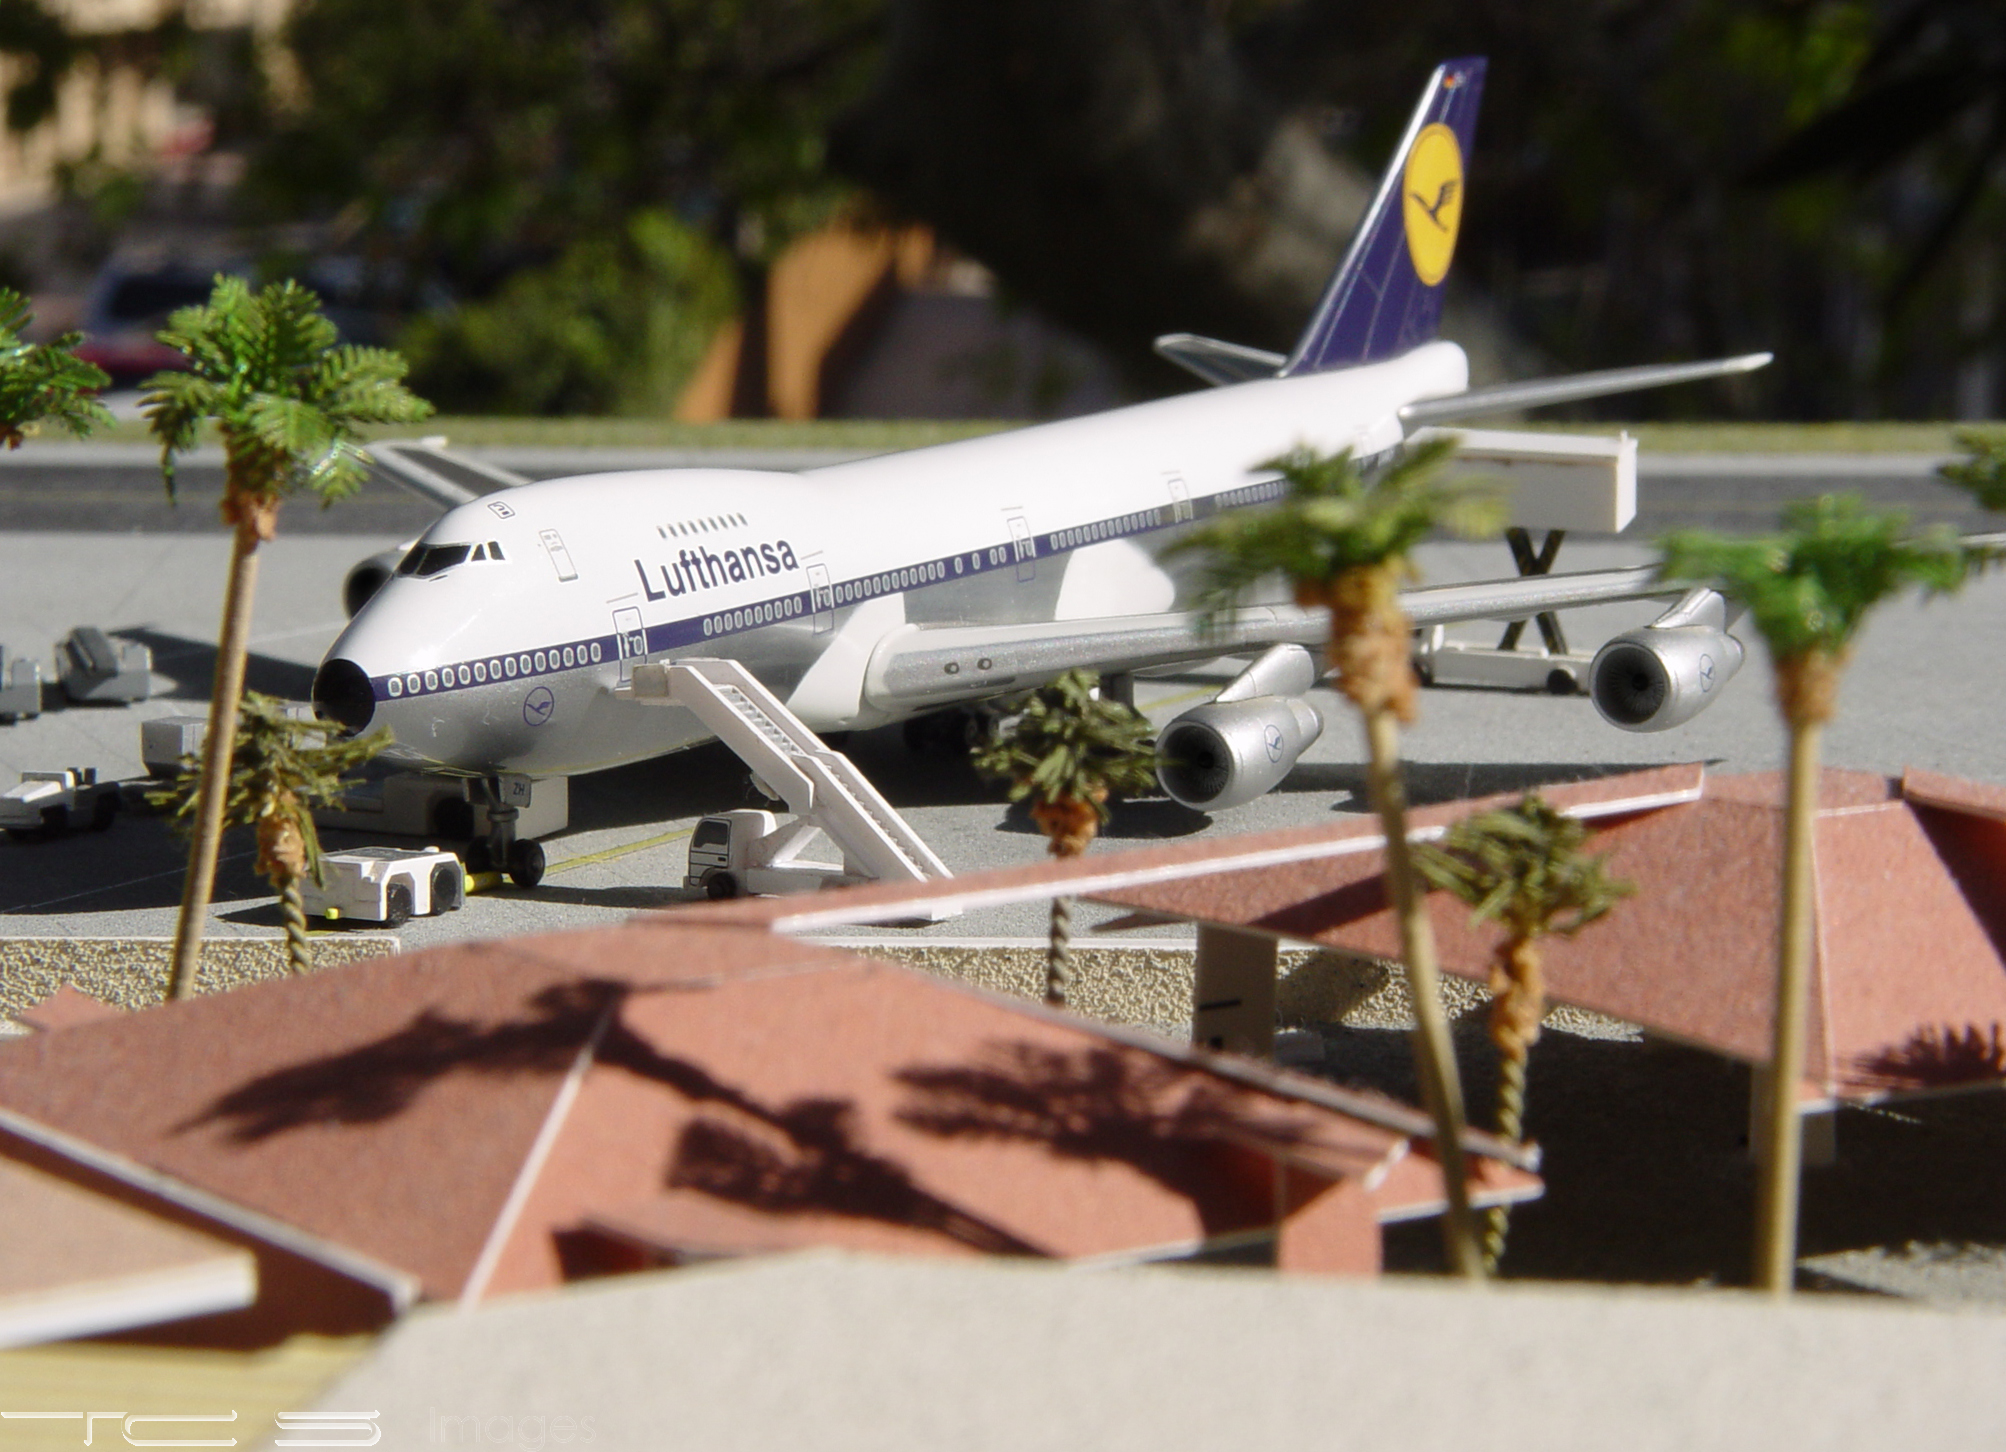 Lufthansa 747-230B